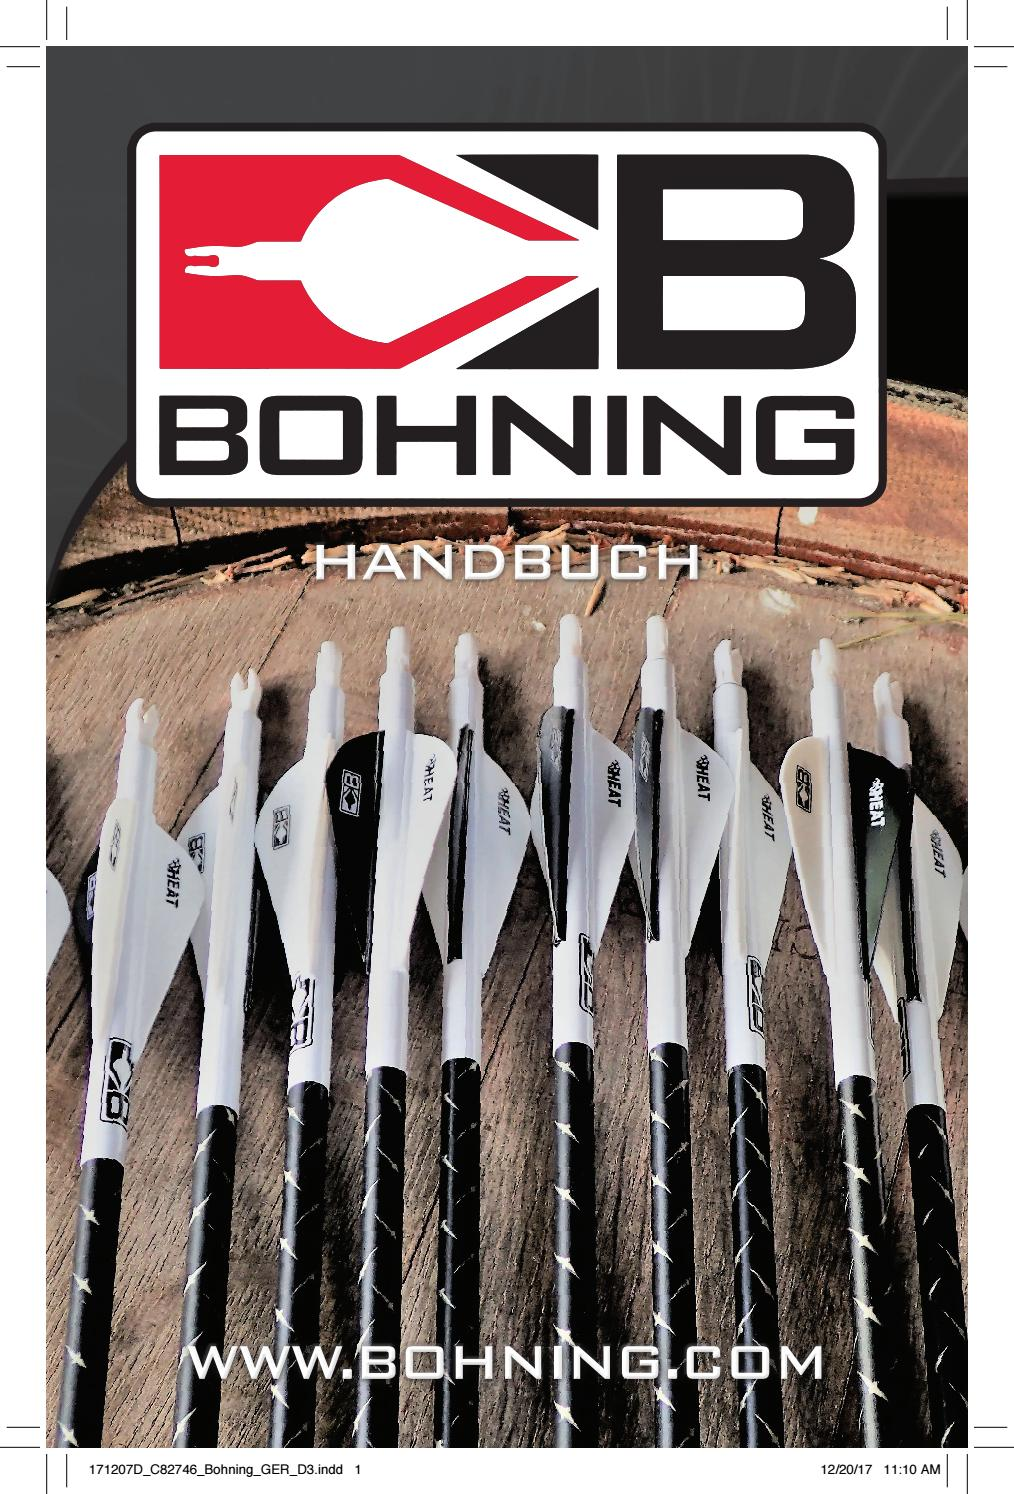 Pfeil Pfeil Gefieder Jagd Archery Fletching Teile 50 Stück 3 Zoll Heiß